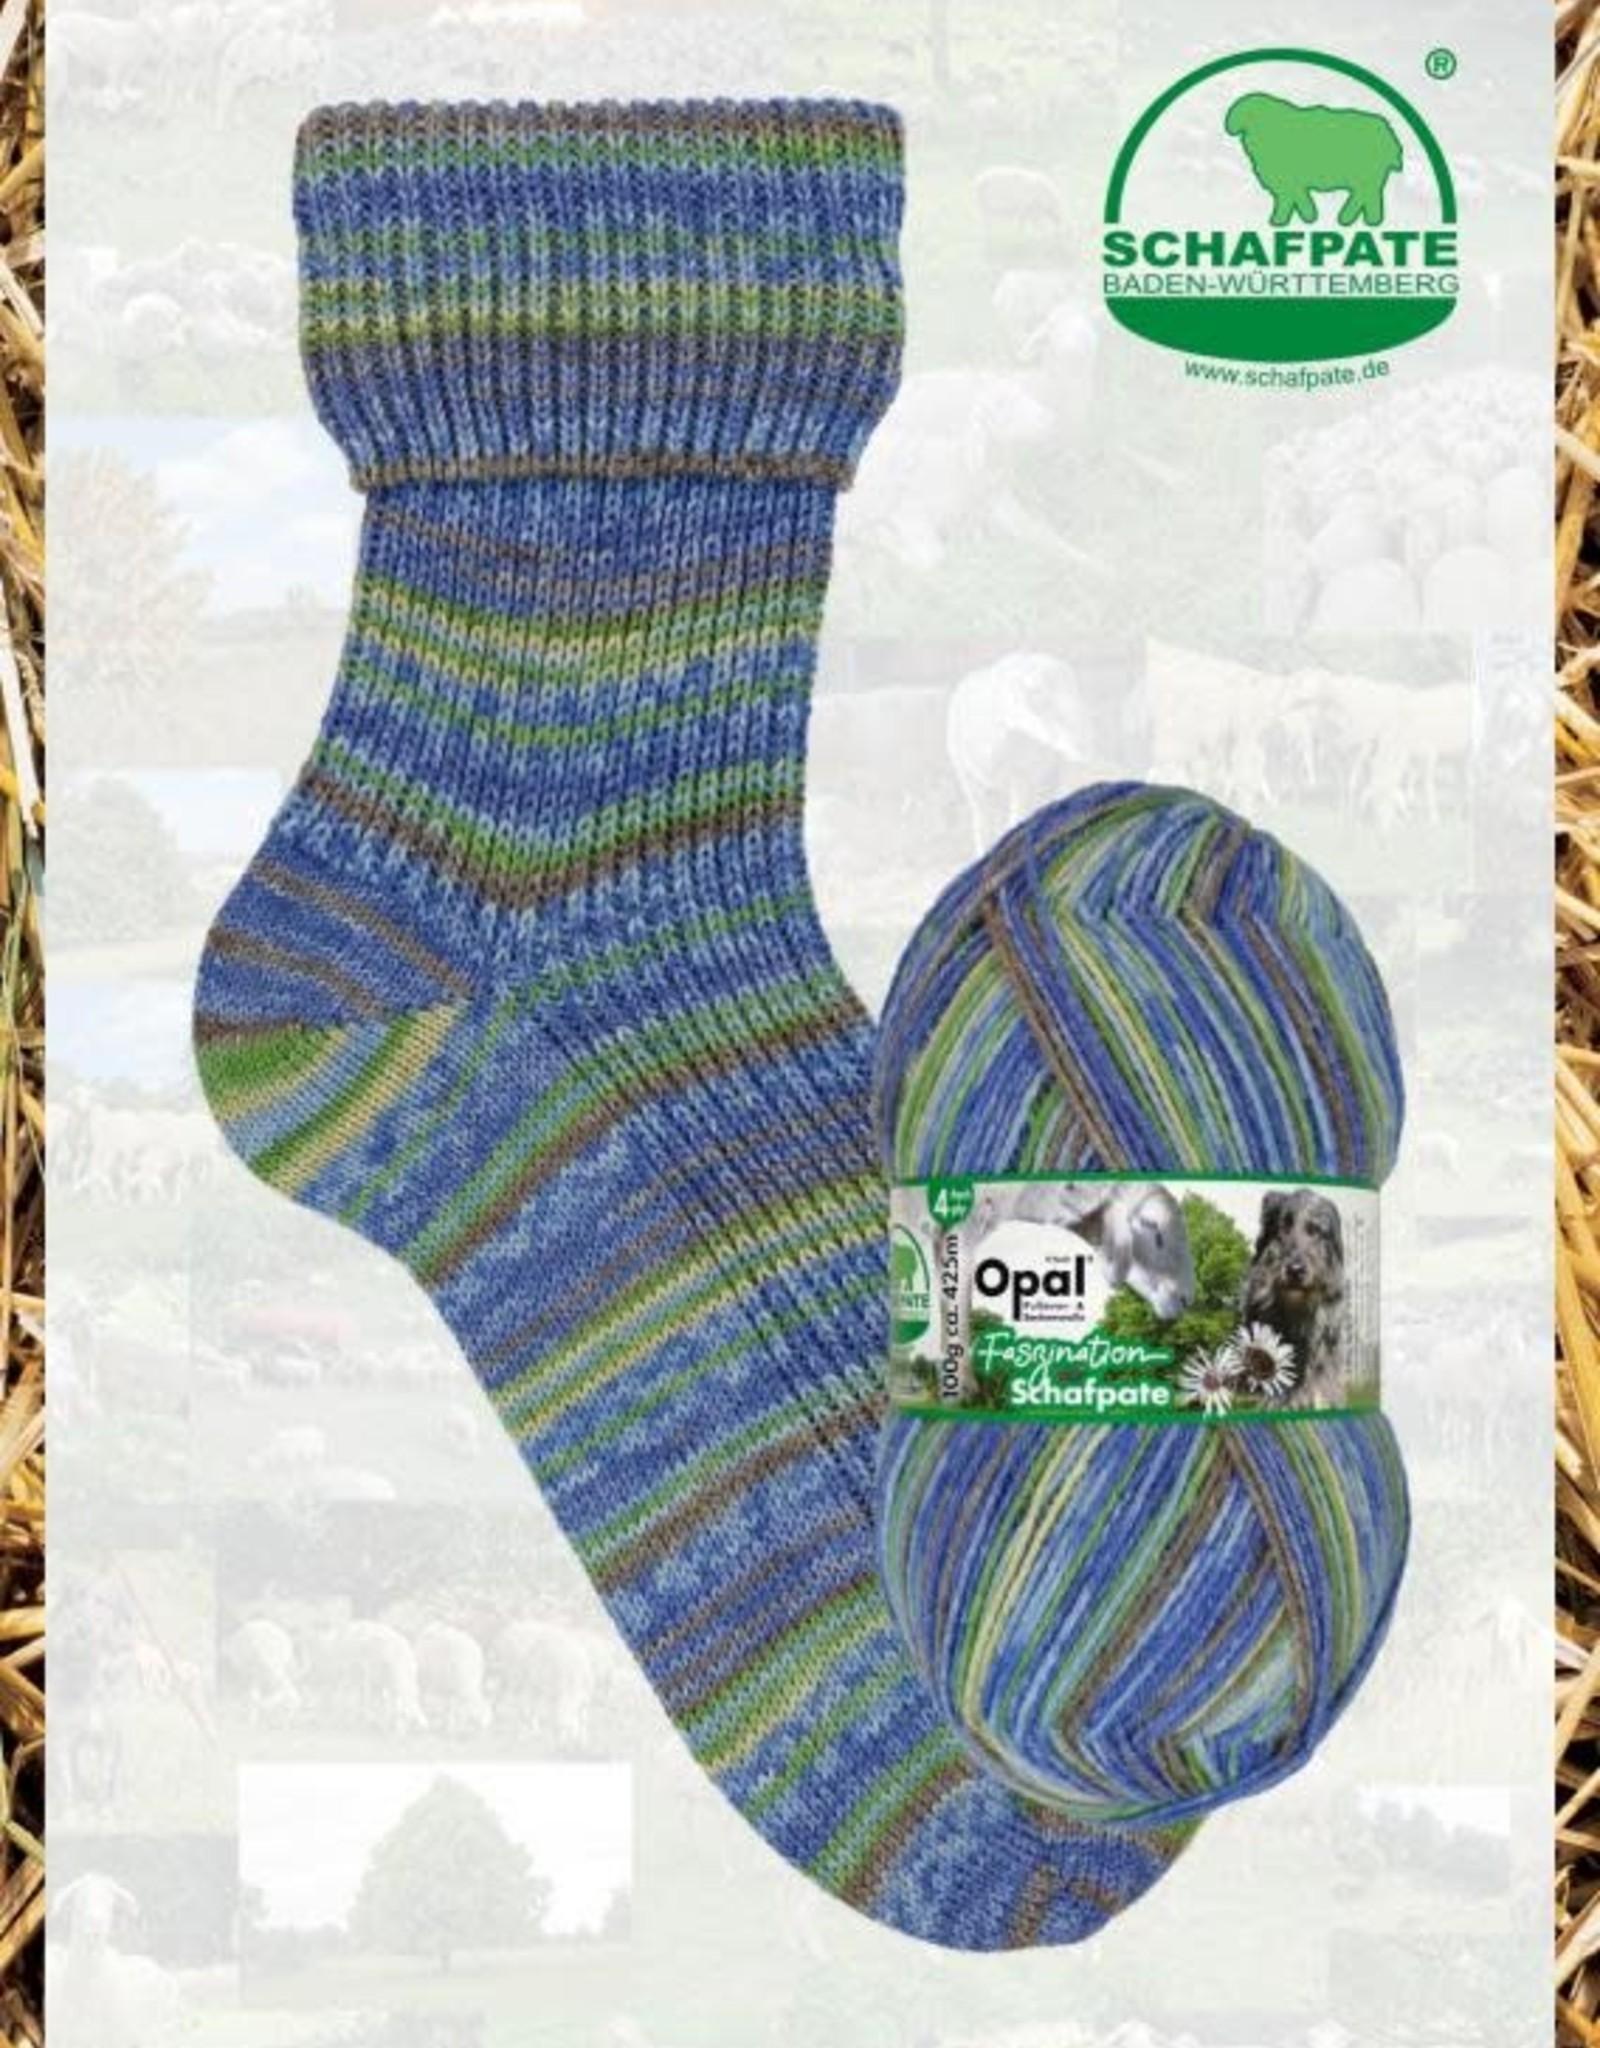 Opal Schafpate 13 - 11031